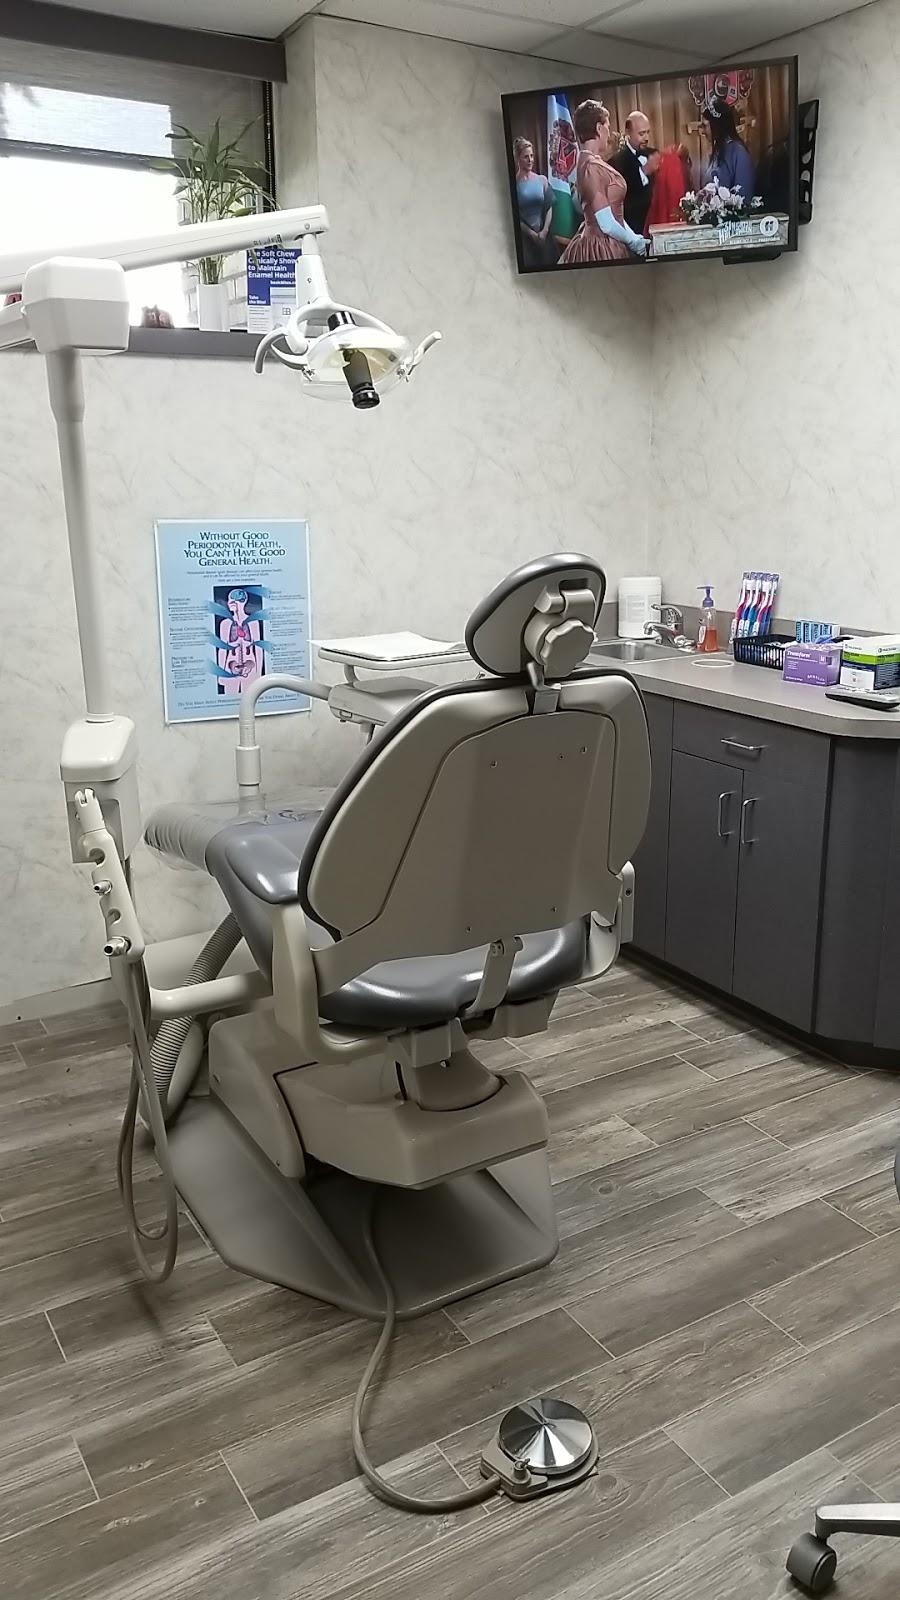 Simony Dental Group - dentist  | Photo 4 of 10 | Address: 41700 Hayes Rd suite d, Clinton Twp, MI 48038, USA | Phone: (586) 263-9300